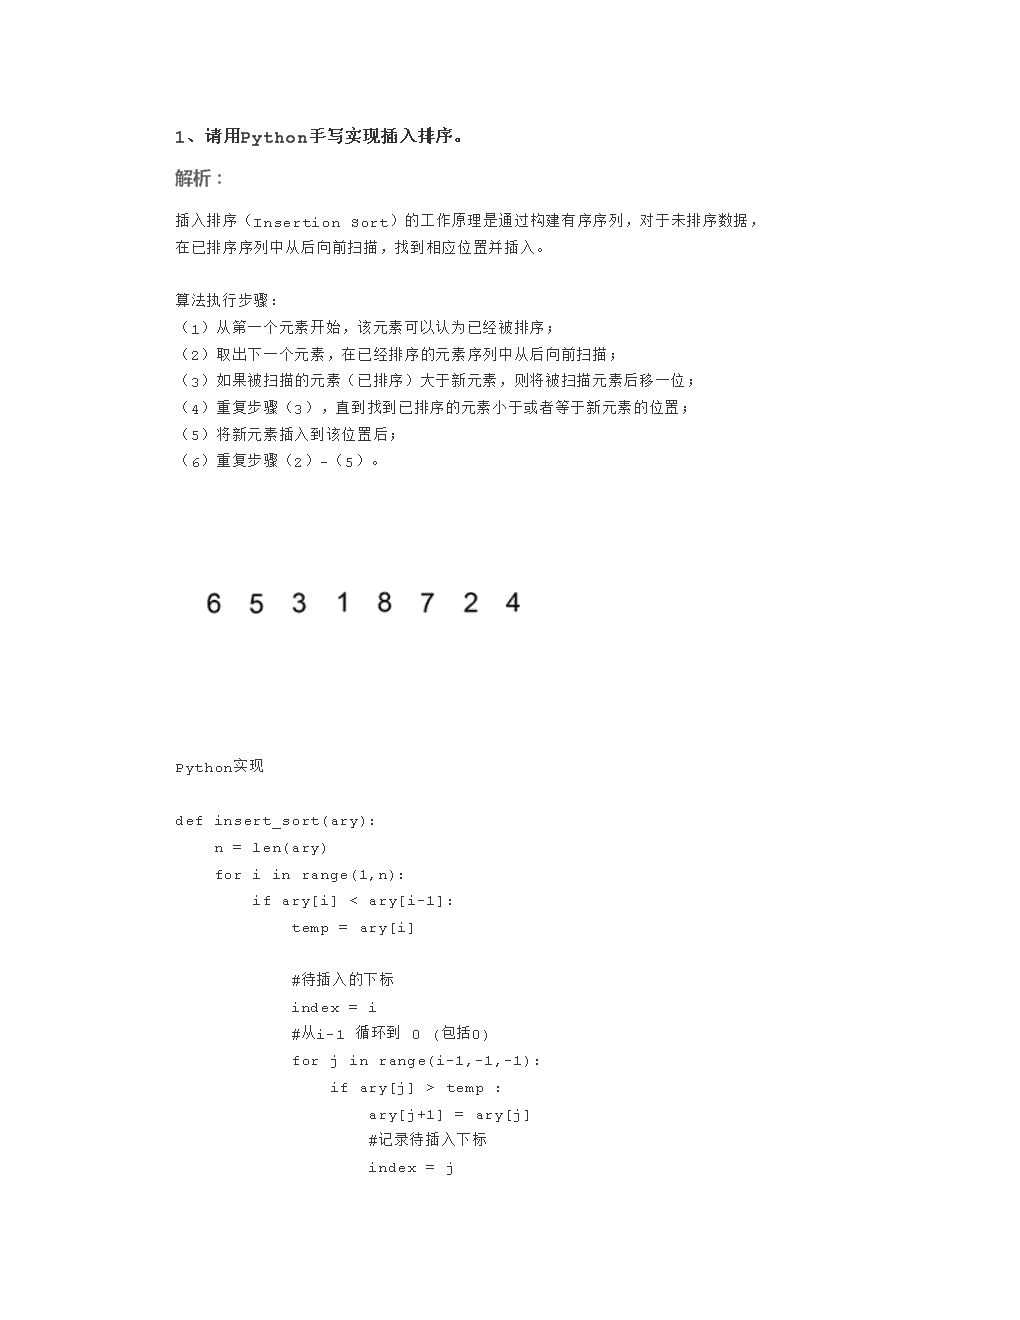 AI笔试面试题库-Python题目解析4.doc